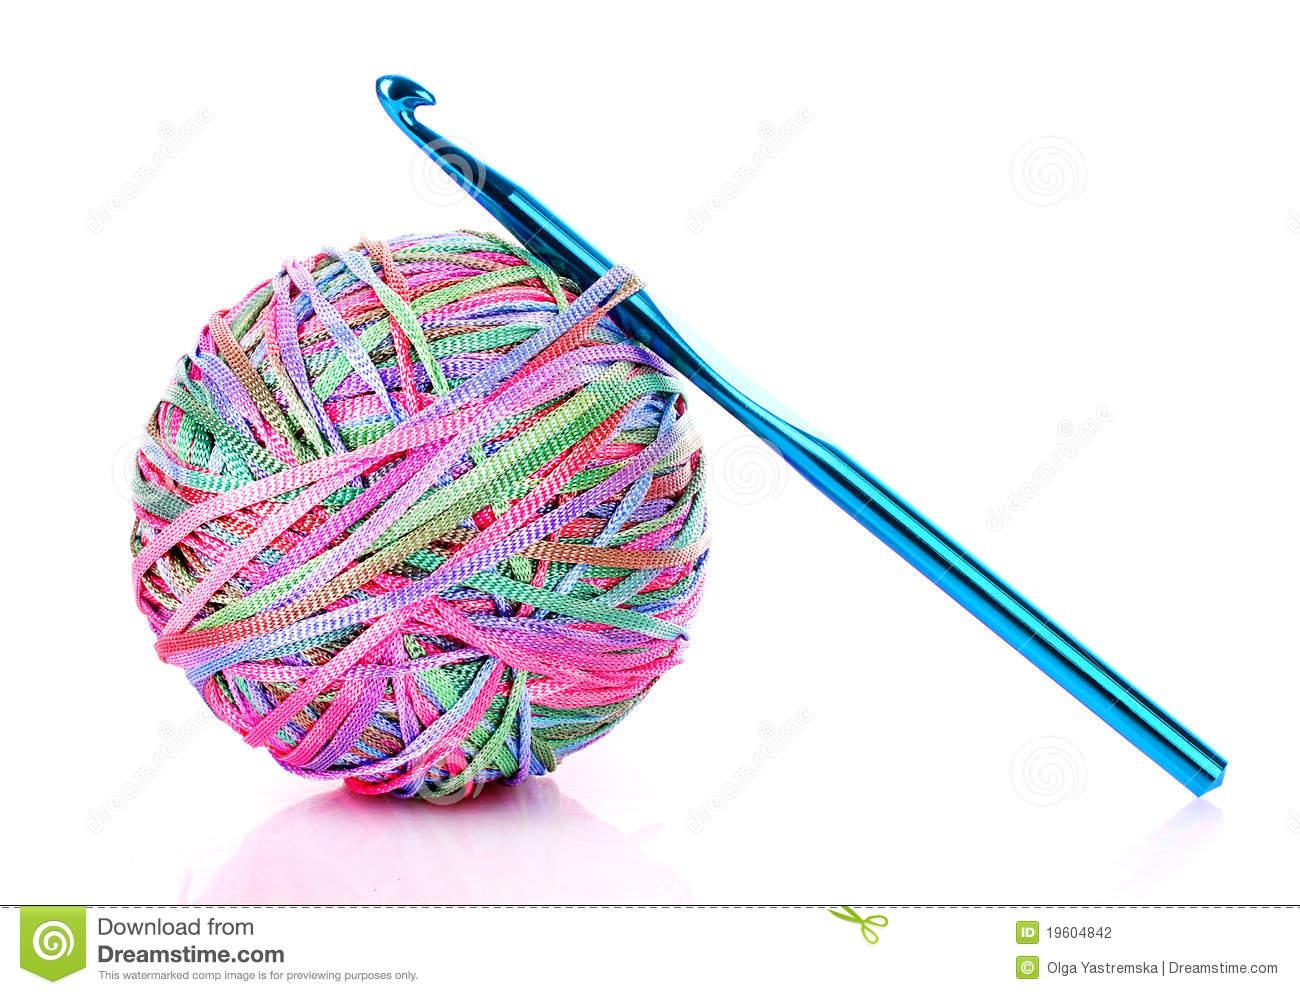 Seivo   Image   Crochet Hook Clip Art   Seivo Web Search Engine